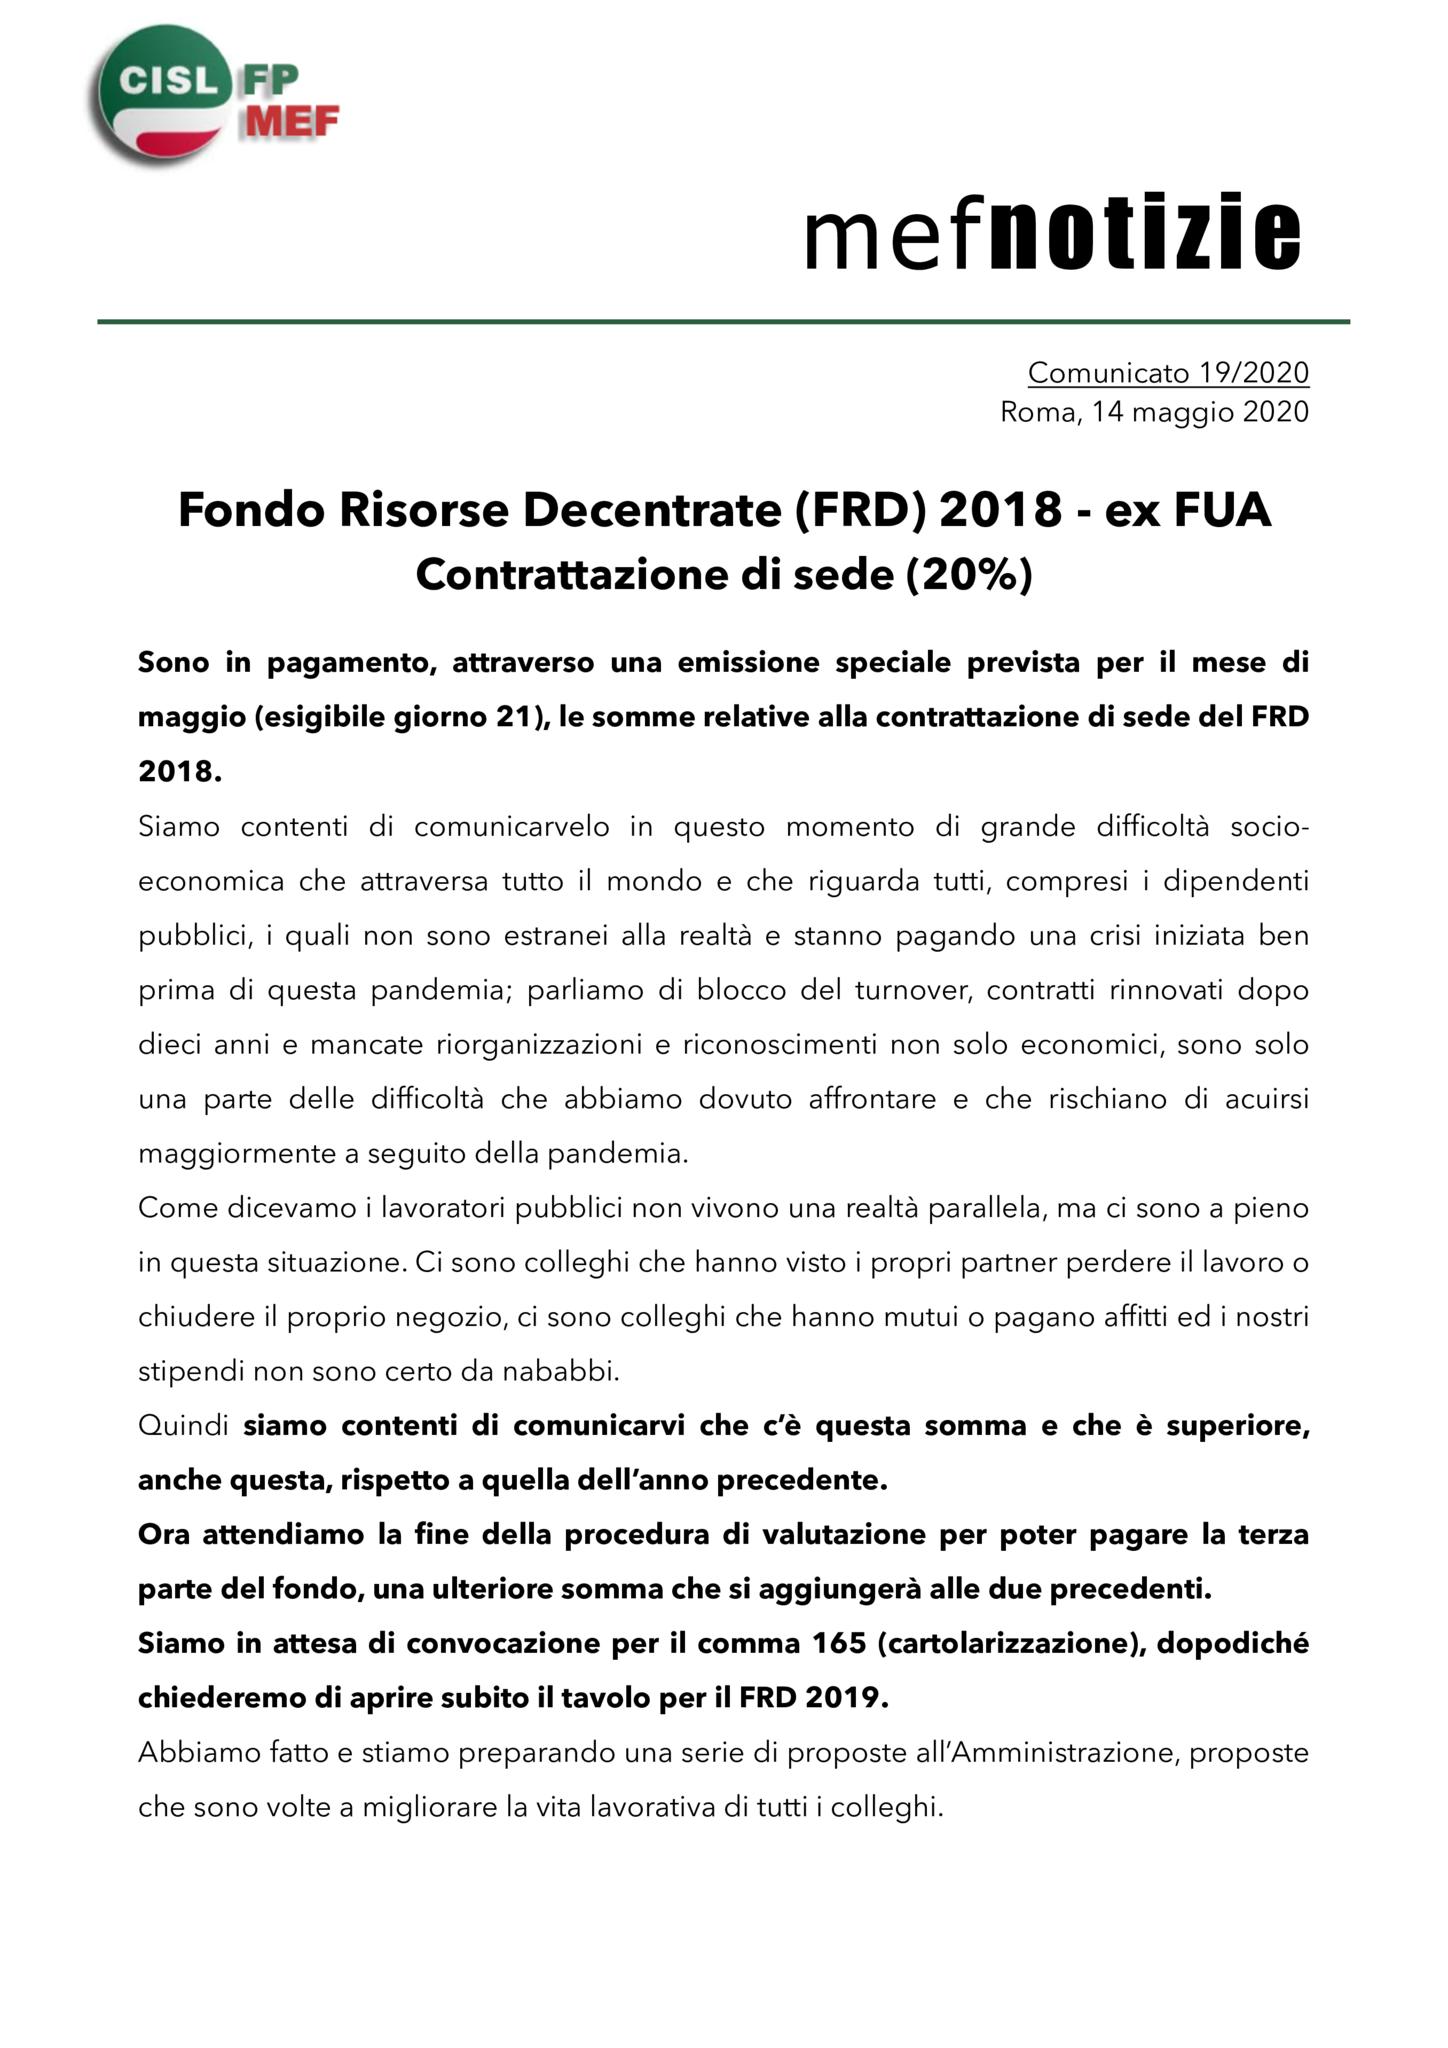 thumbnail of mef-notizie-FRD-2018-20-ex-FUA